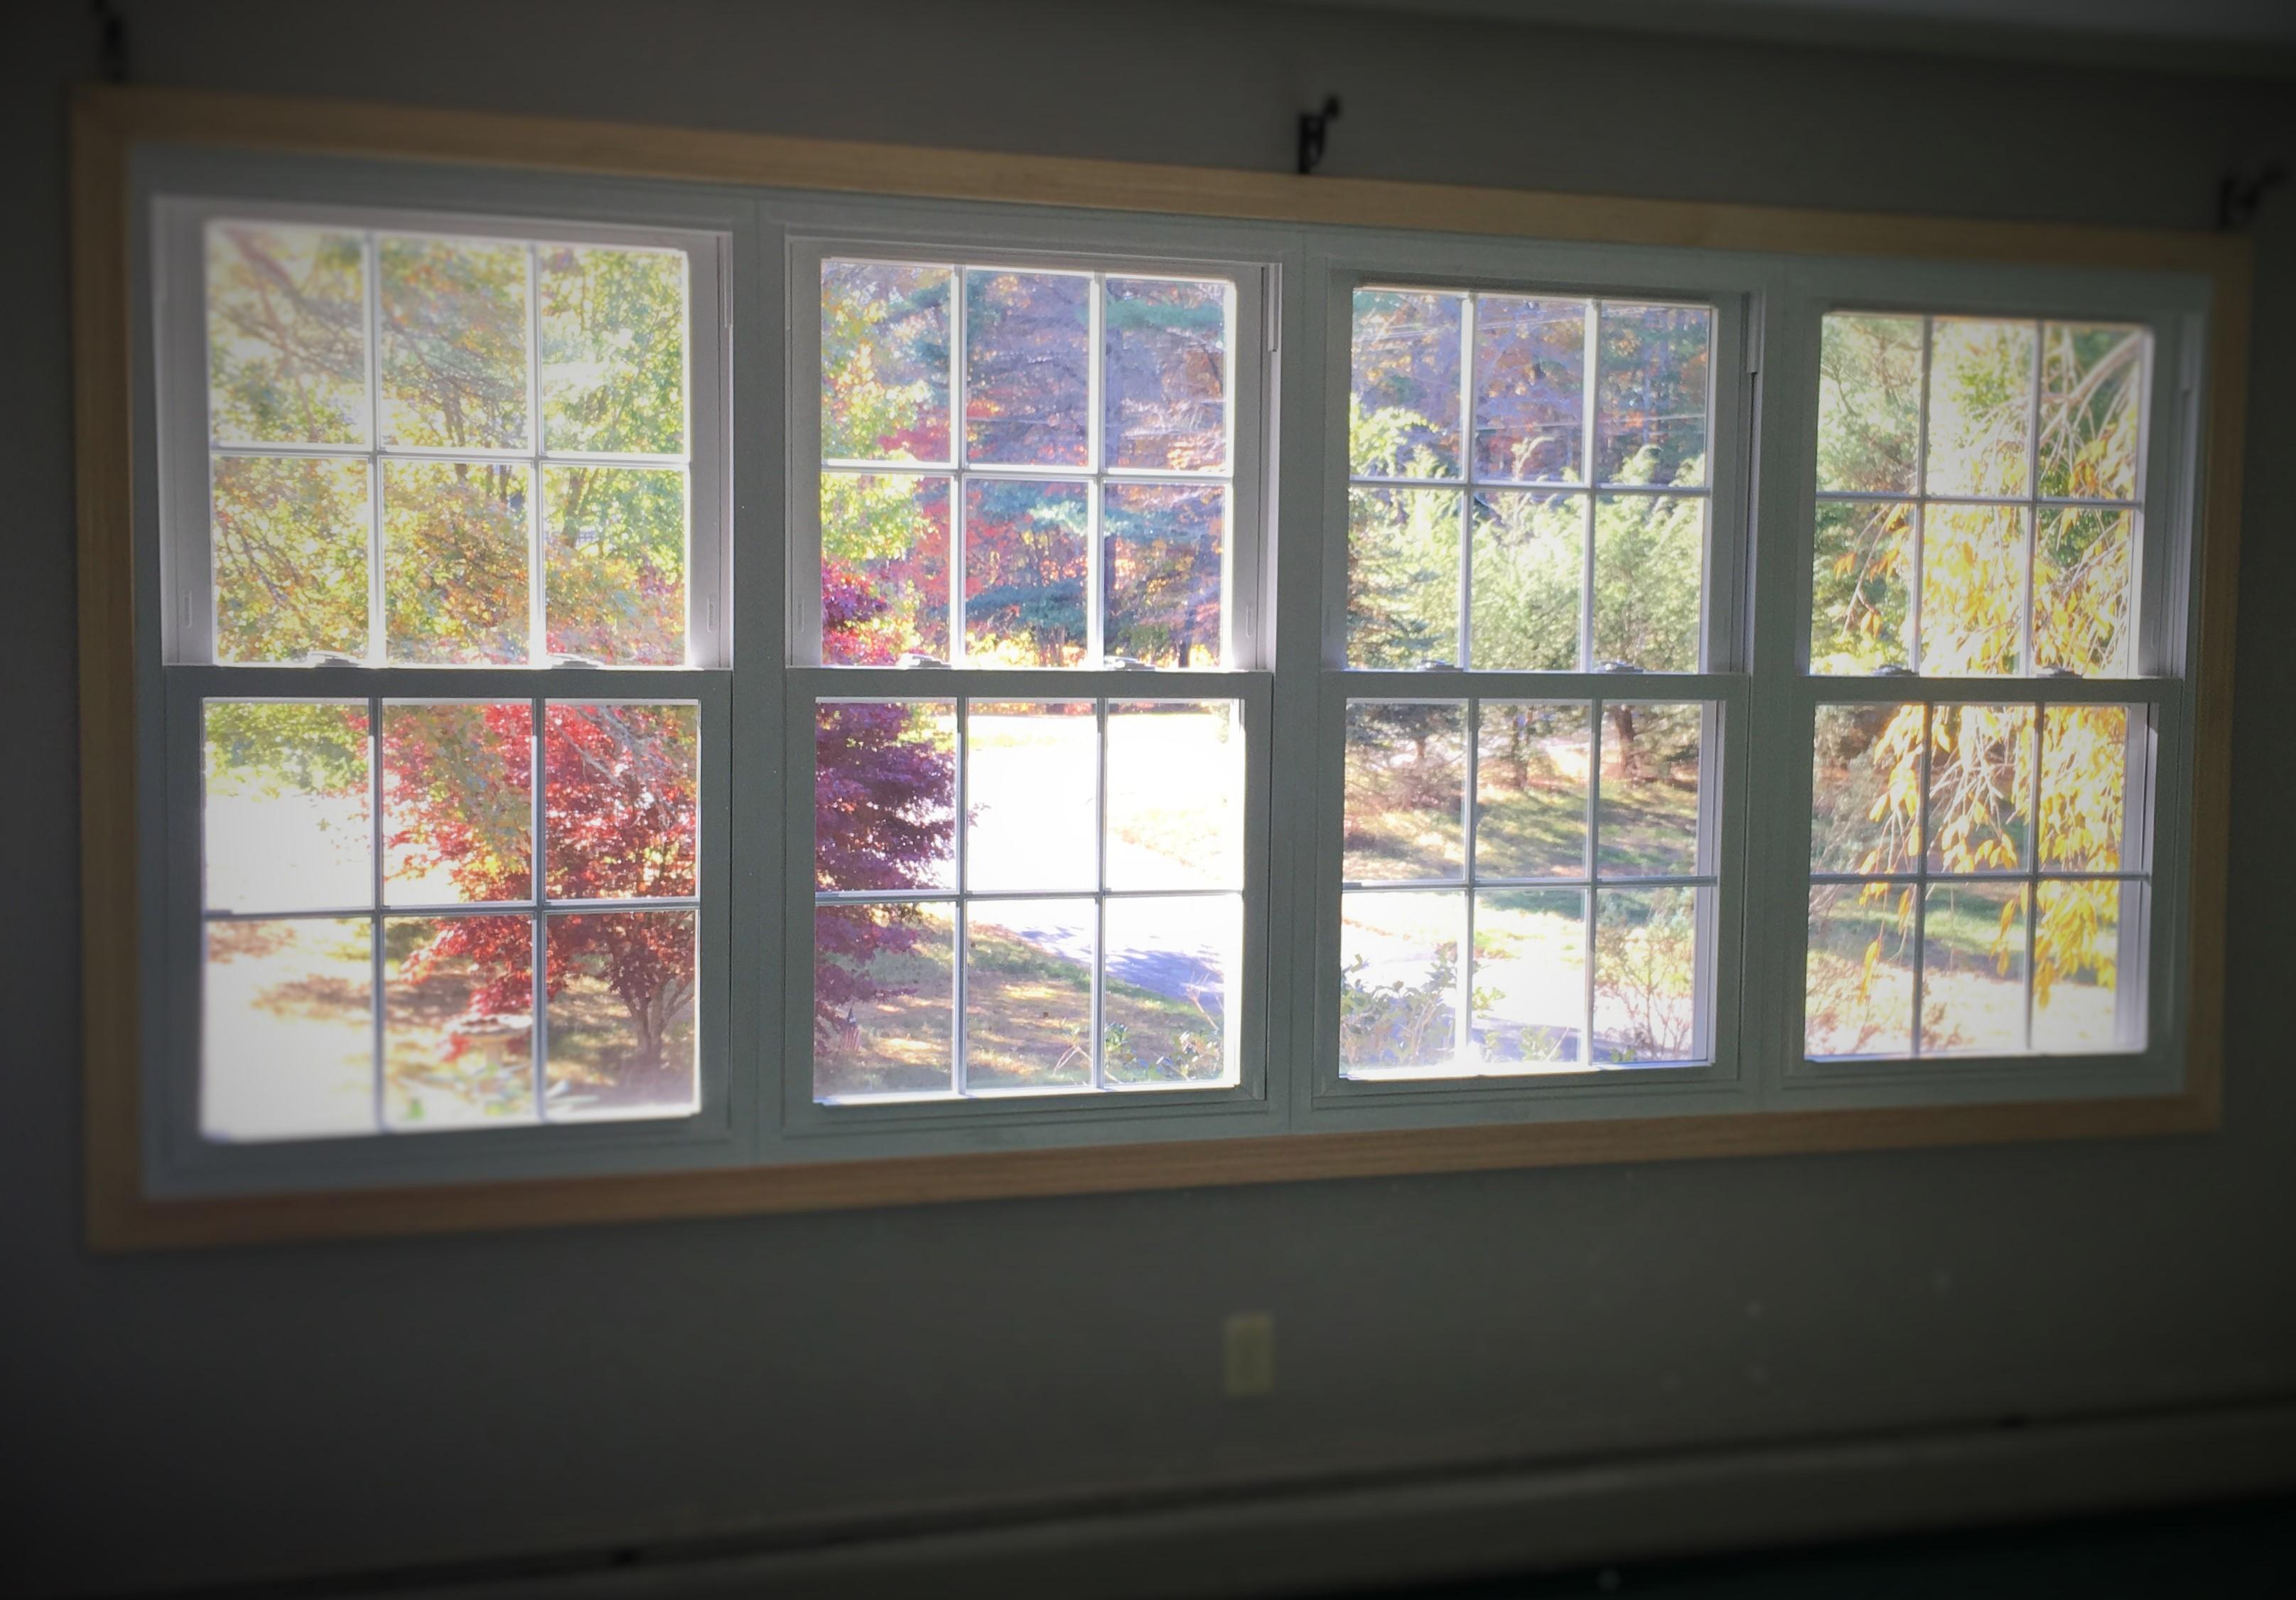 Bay state window door inc new bedford massachusetts for Local windows and doors